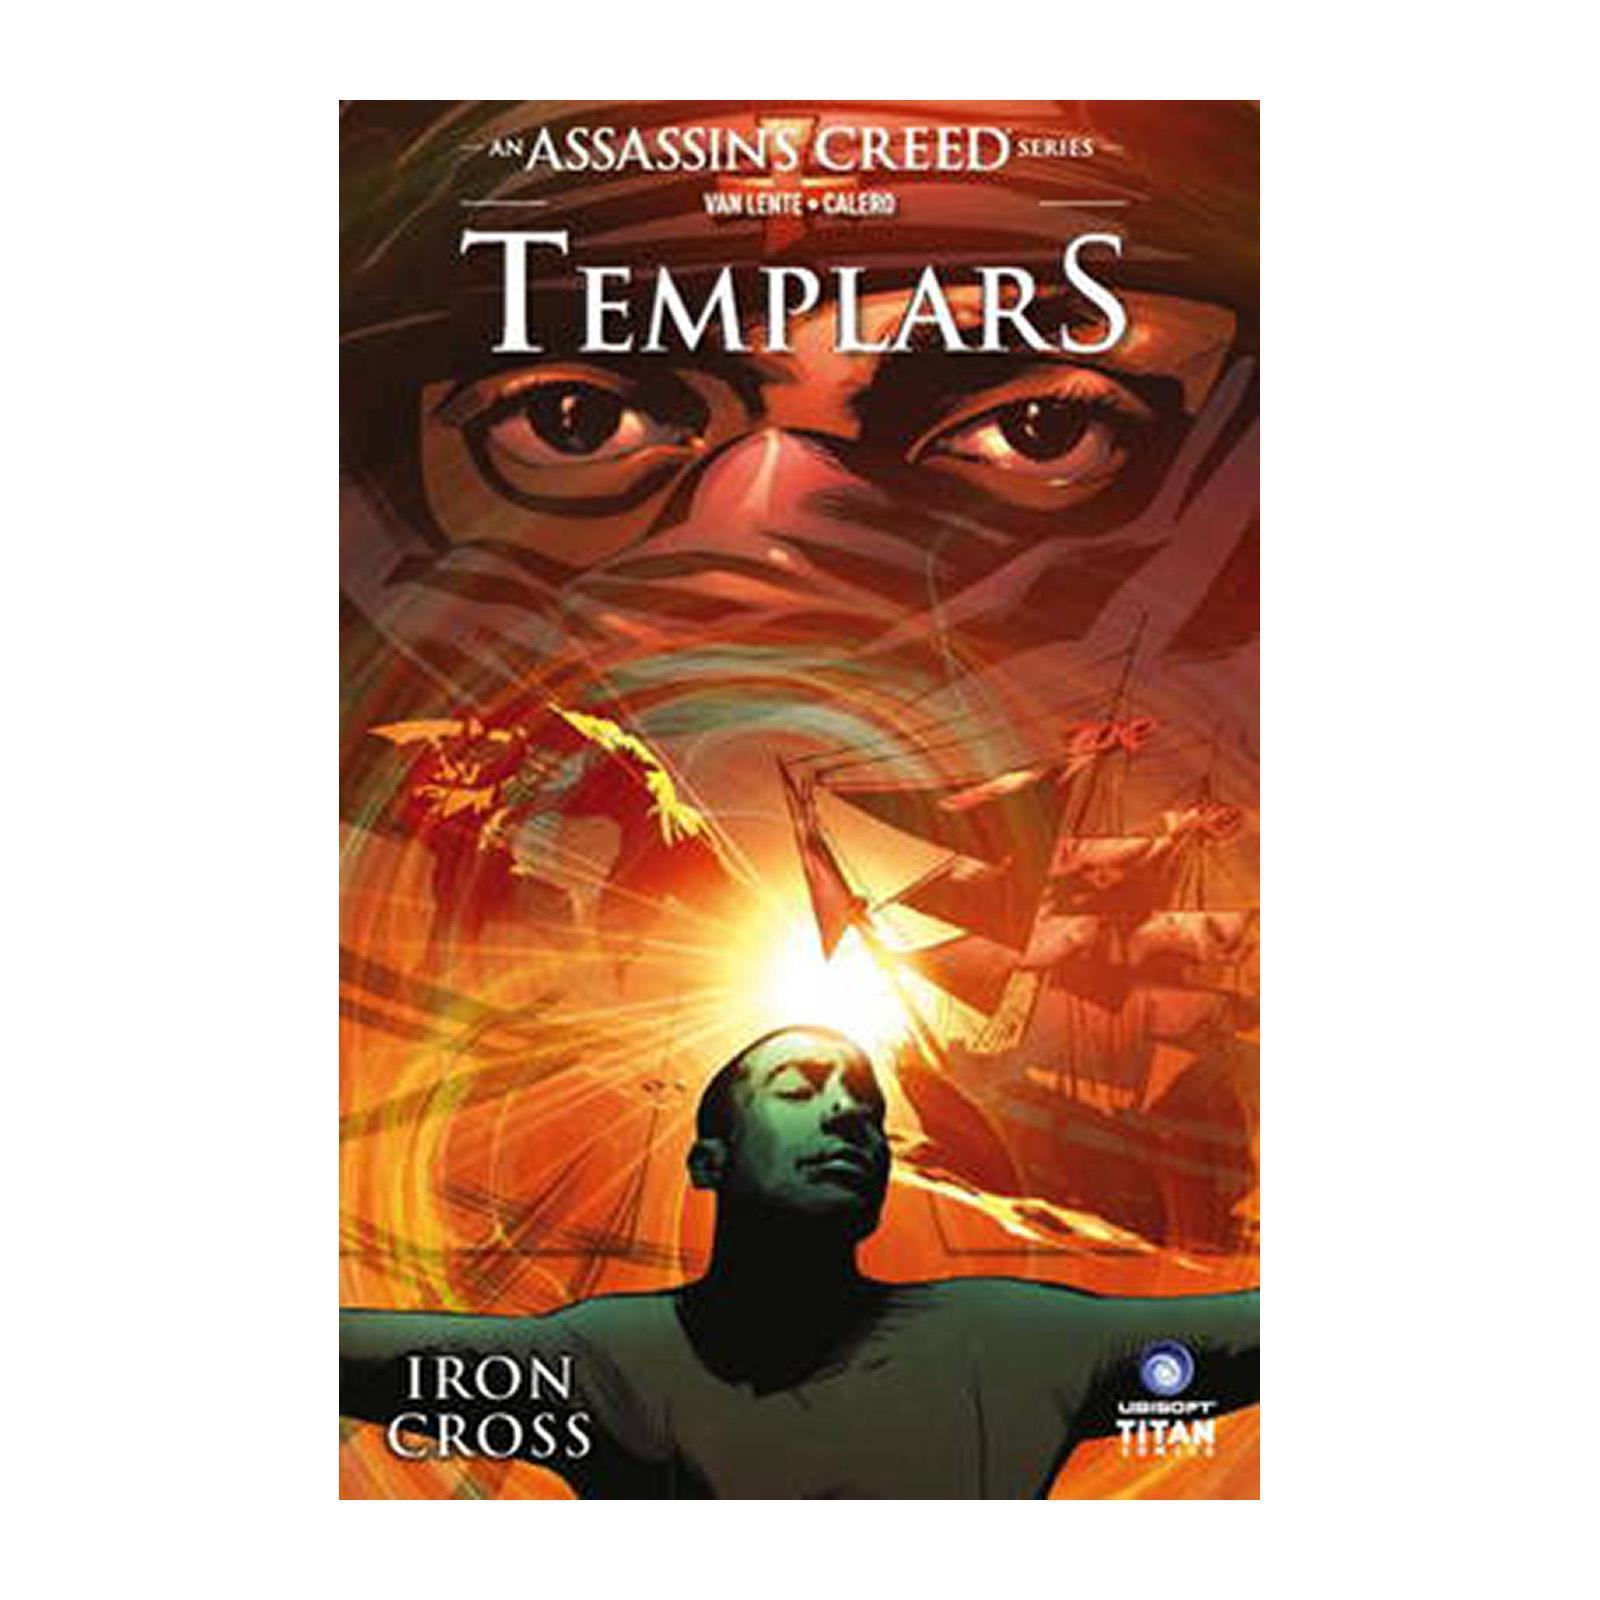 Assassins Creed: Templars Iron Cross (Paperback)